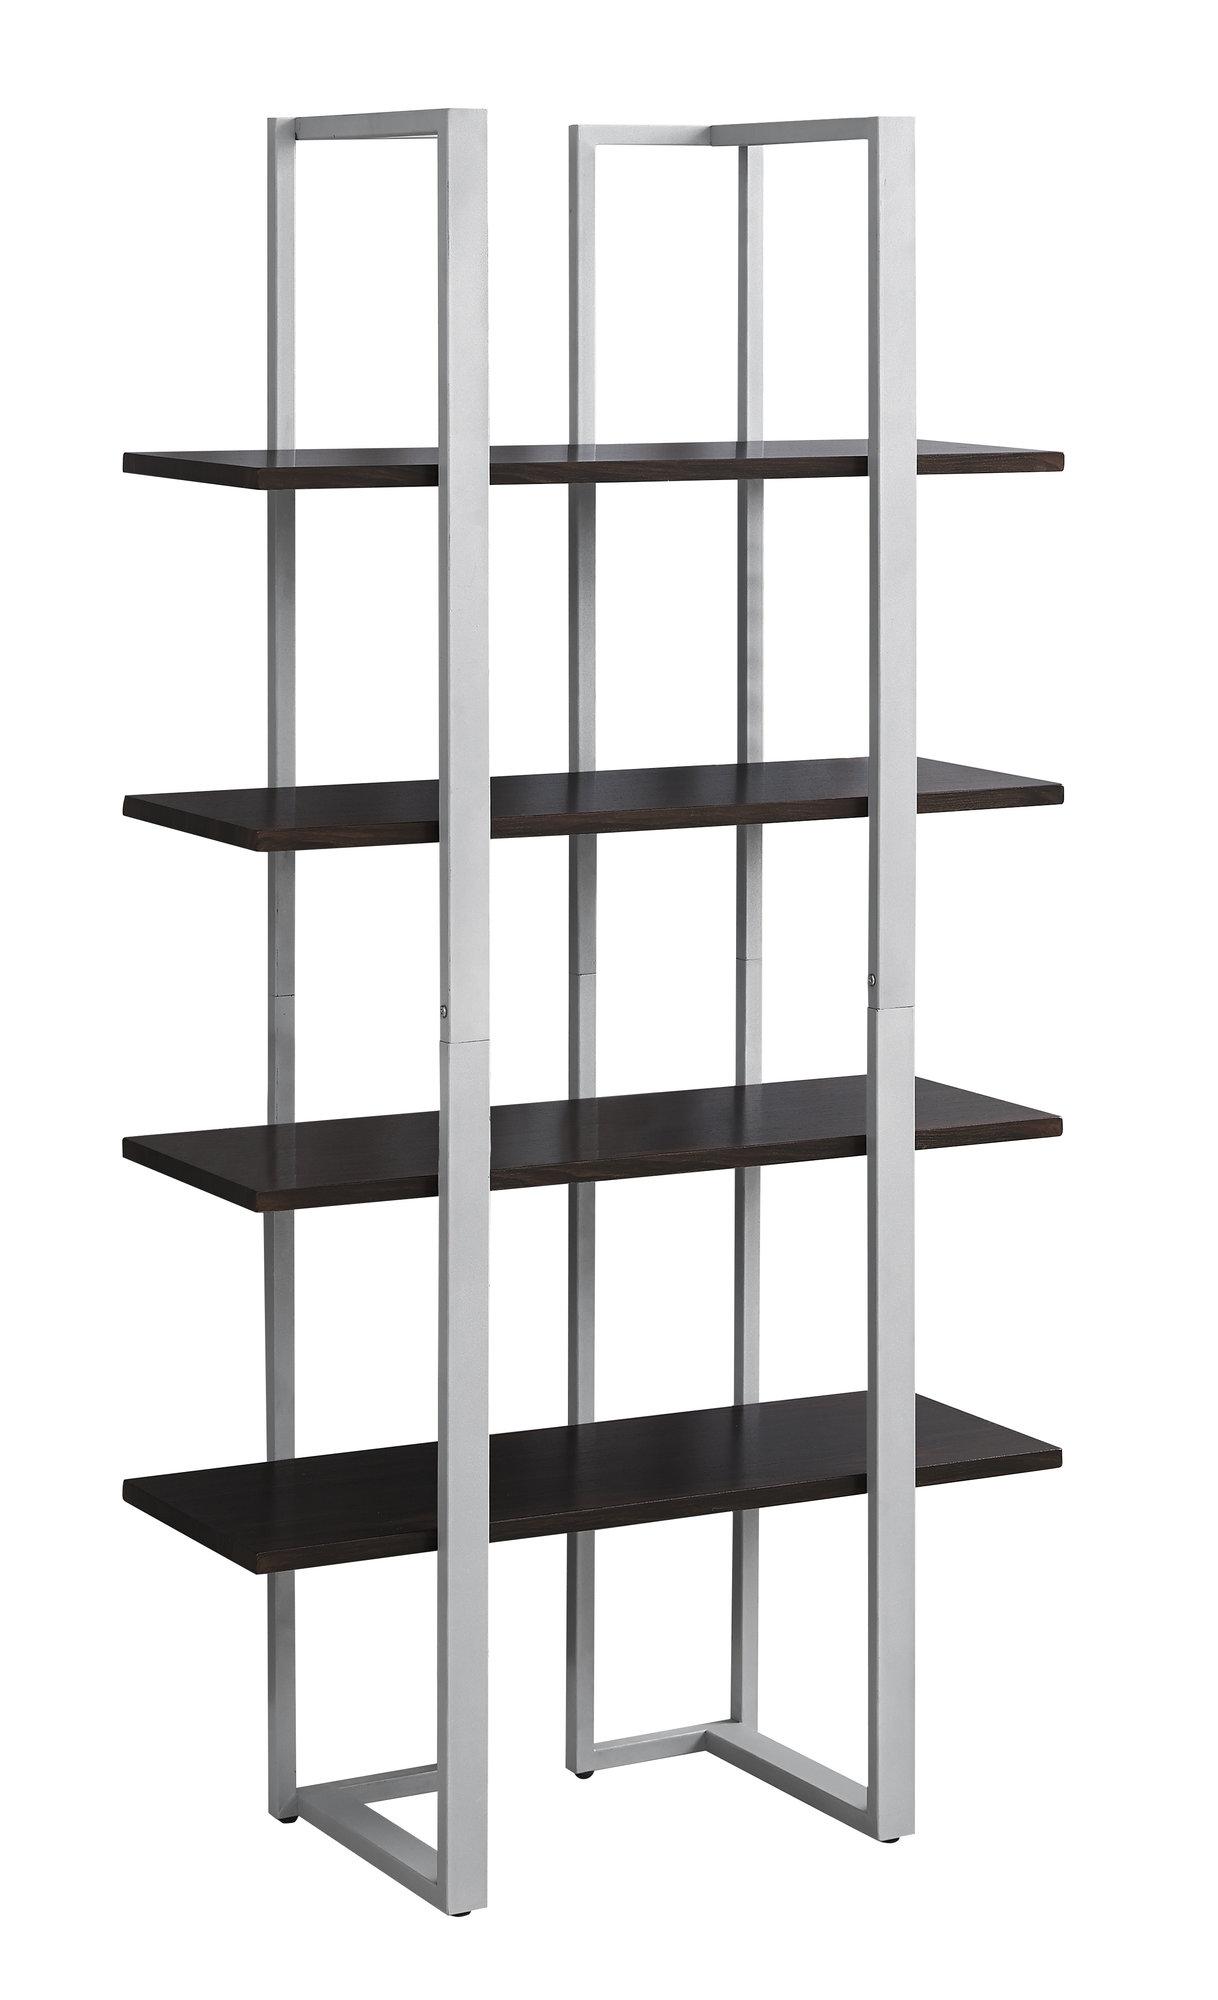 "13.25"" x 32"" x 60"" Cappuccino Silver Mdf Metal  Bookshelf"